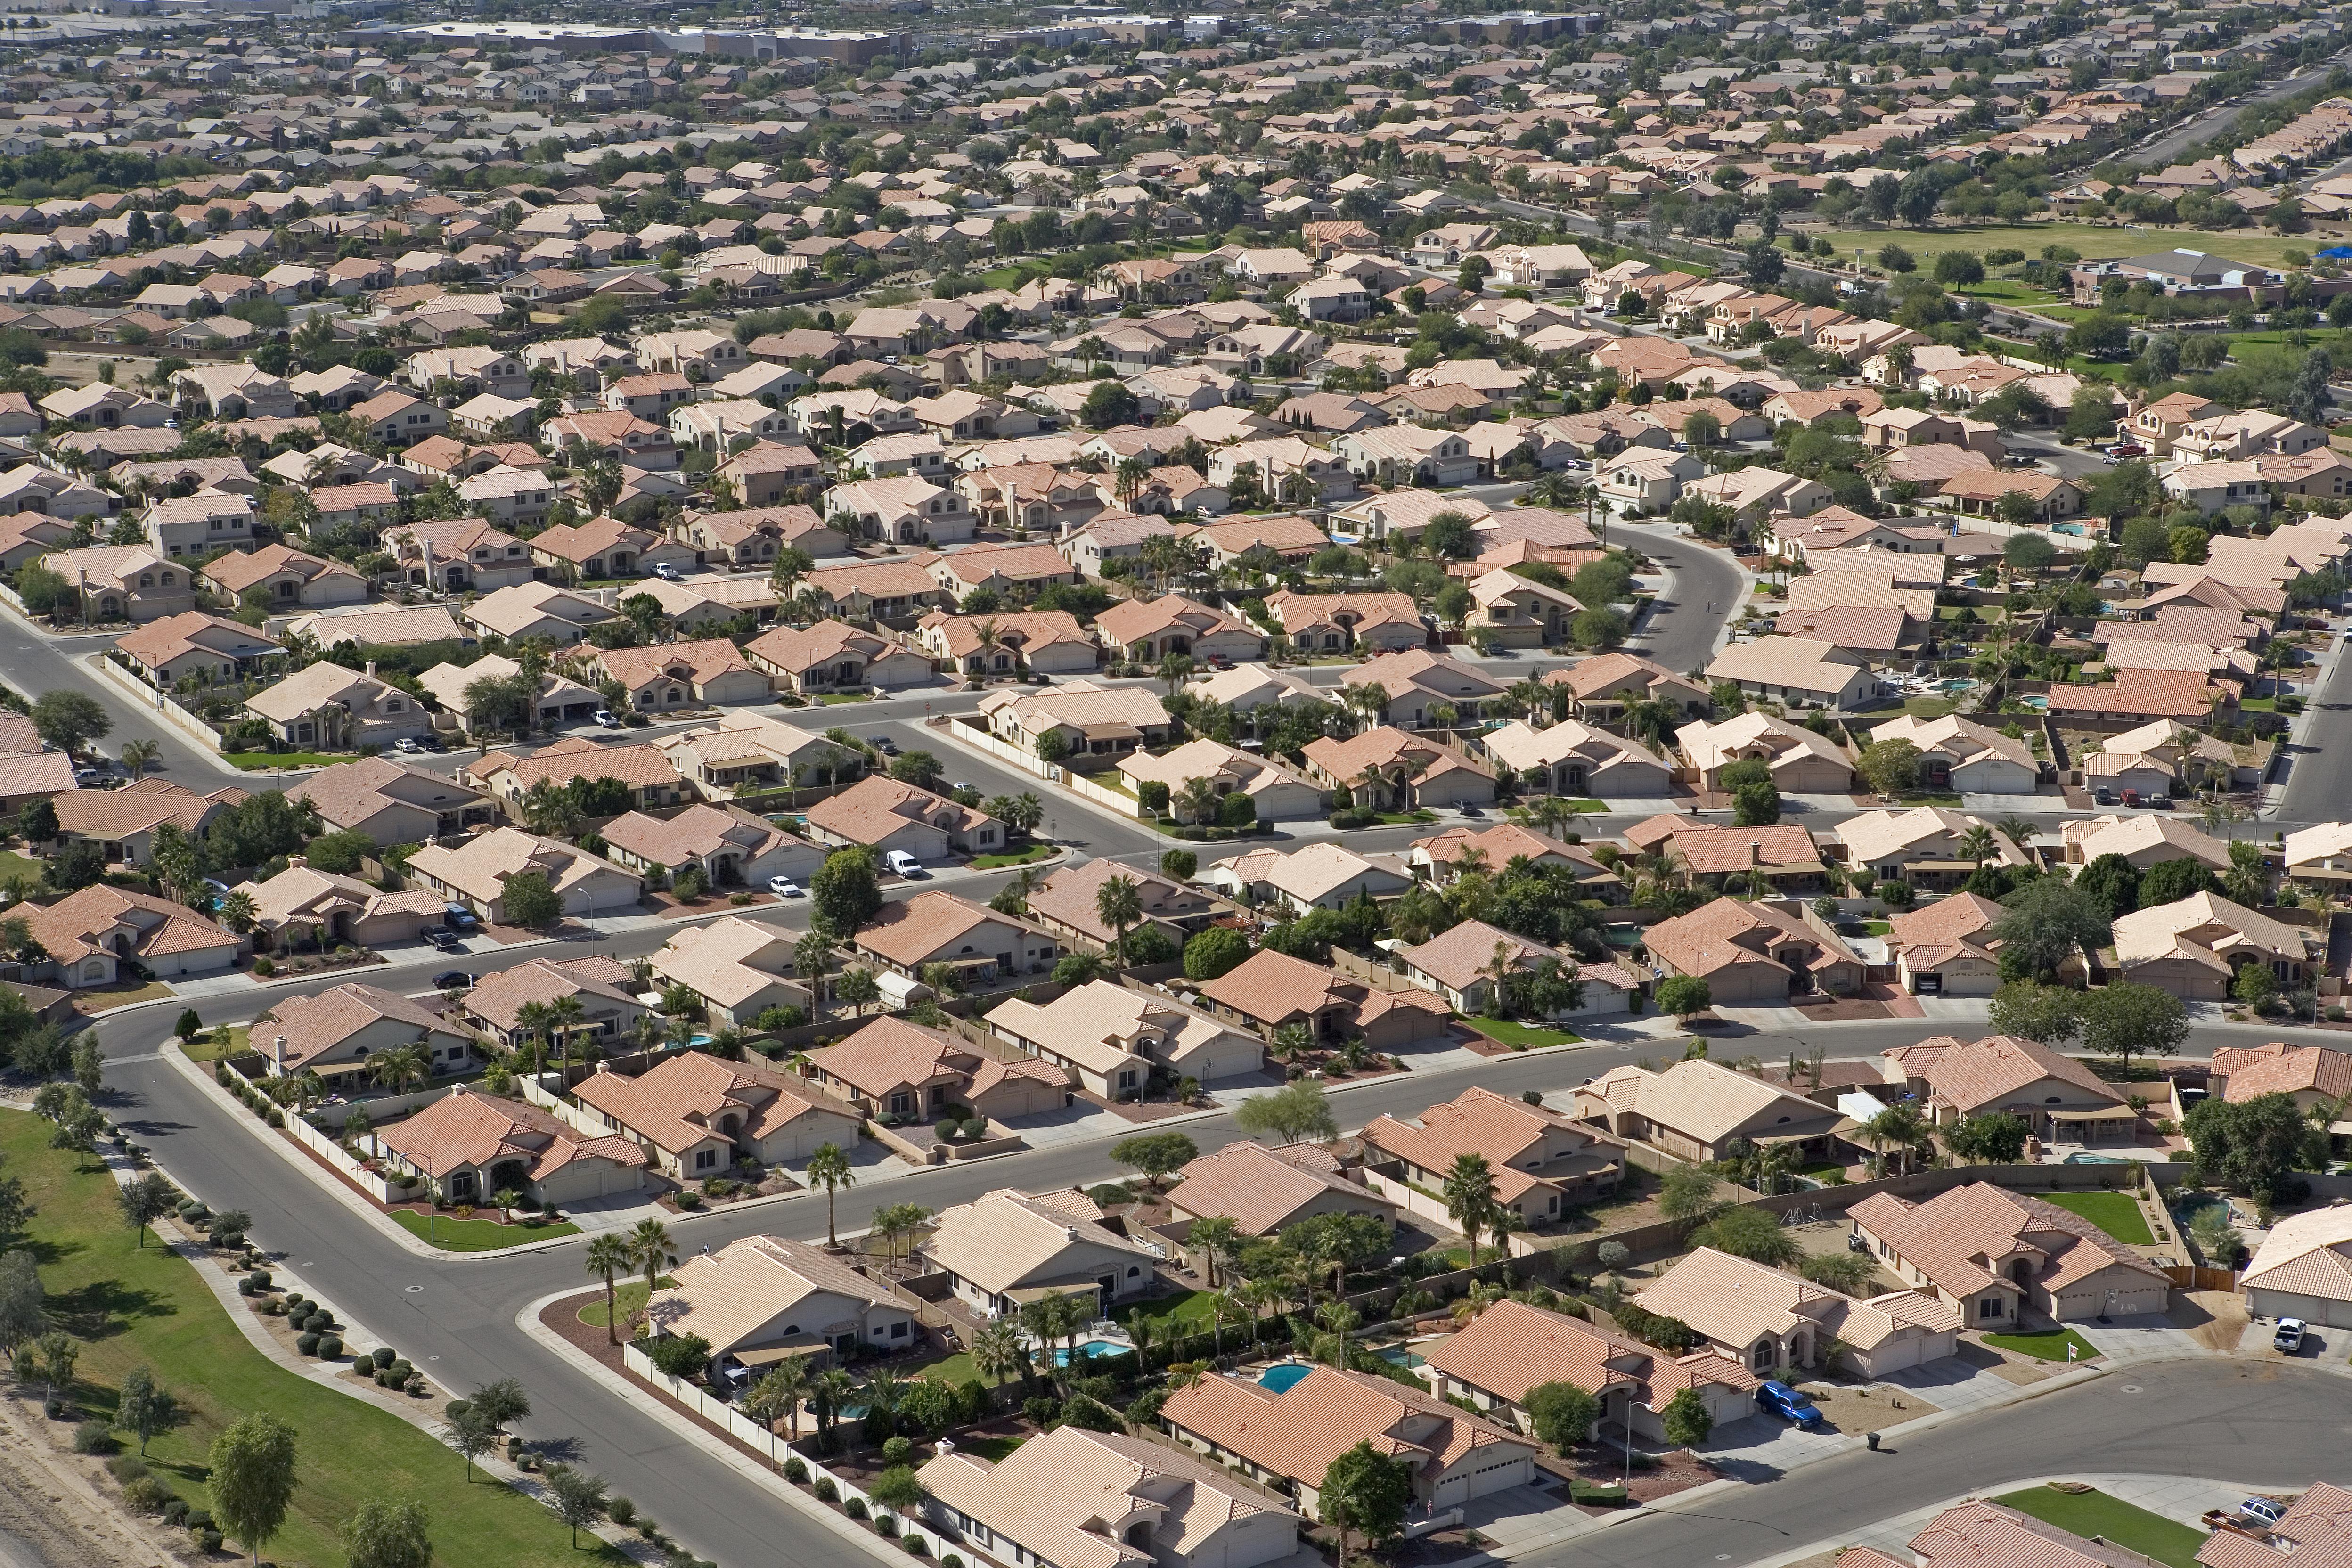 A sprawling housing development in suburban Arizona